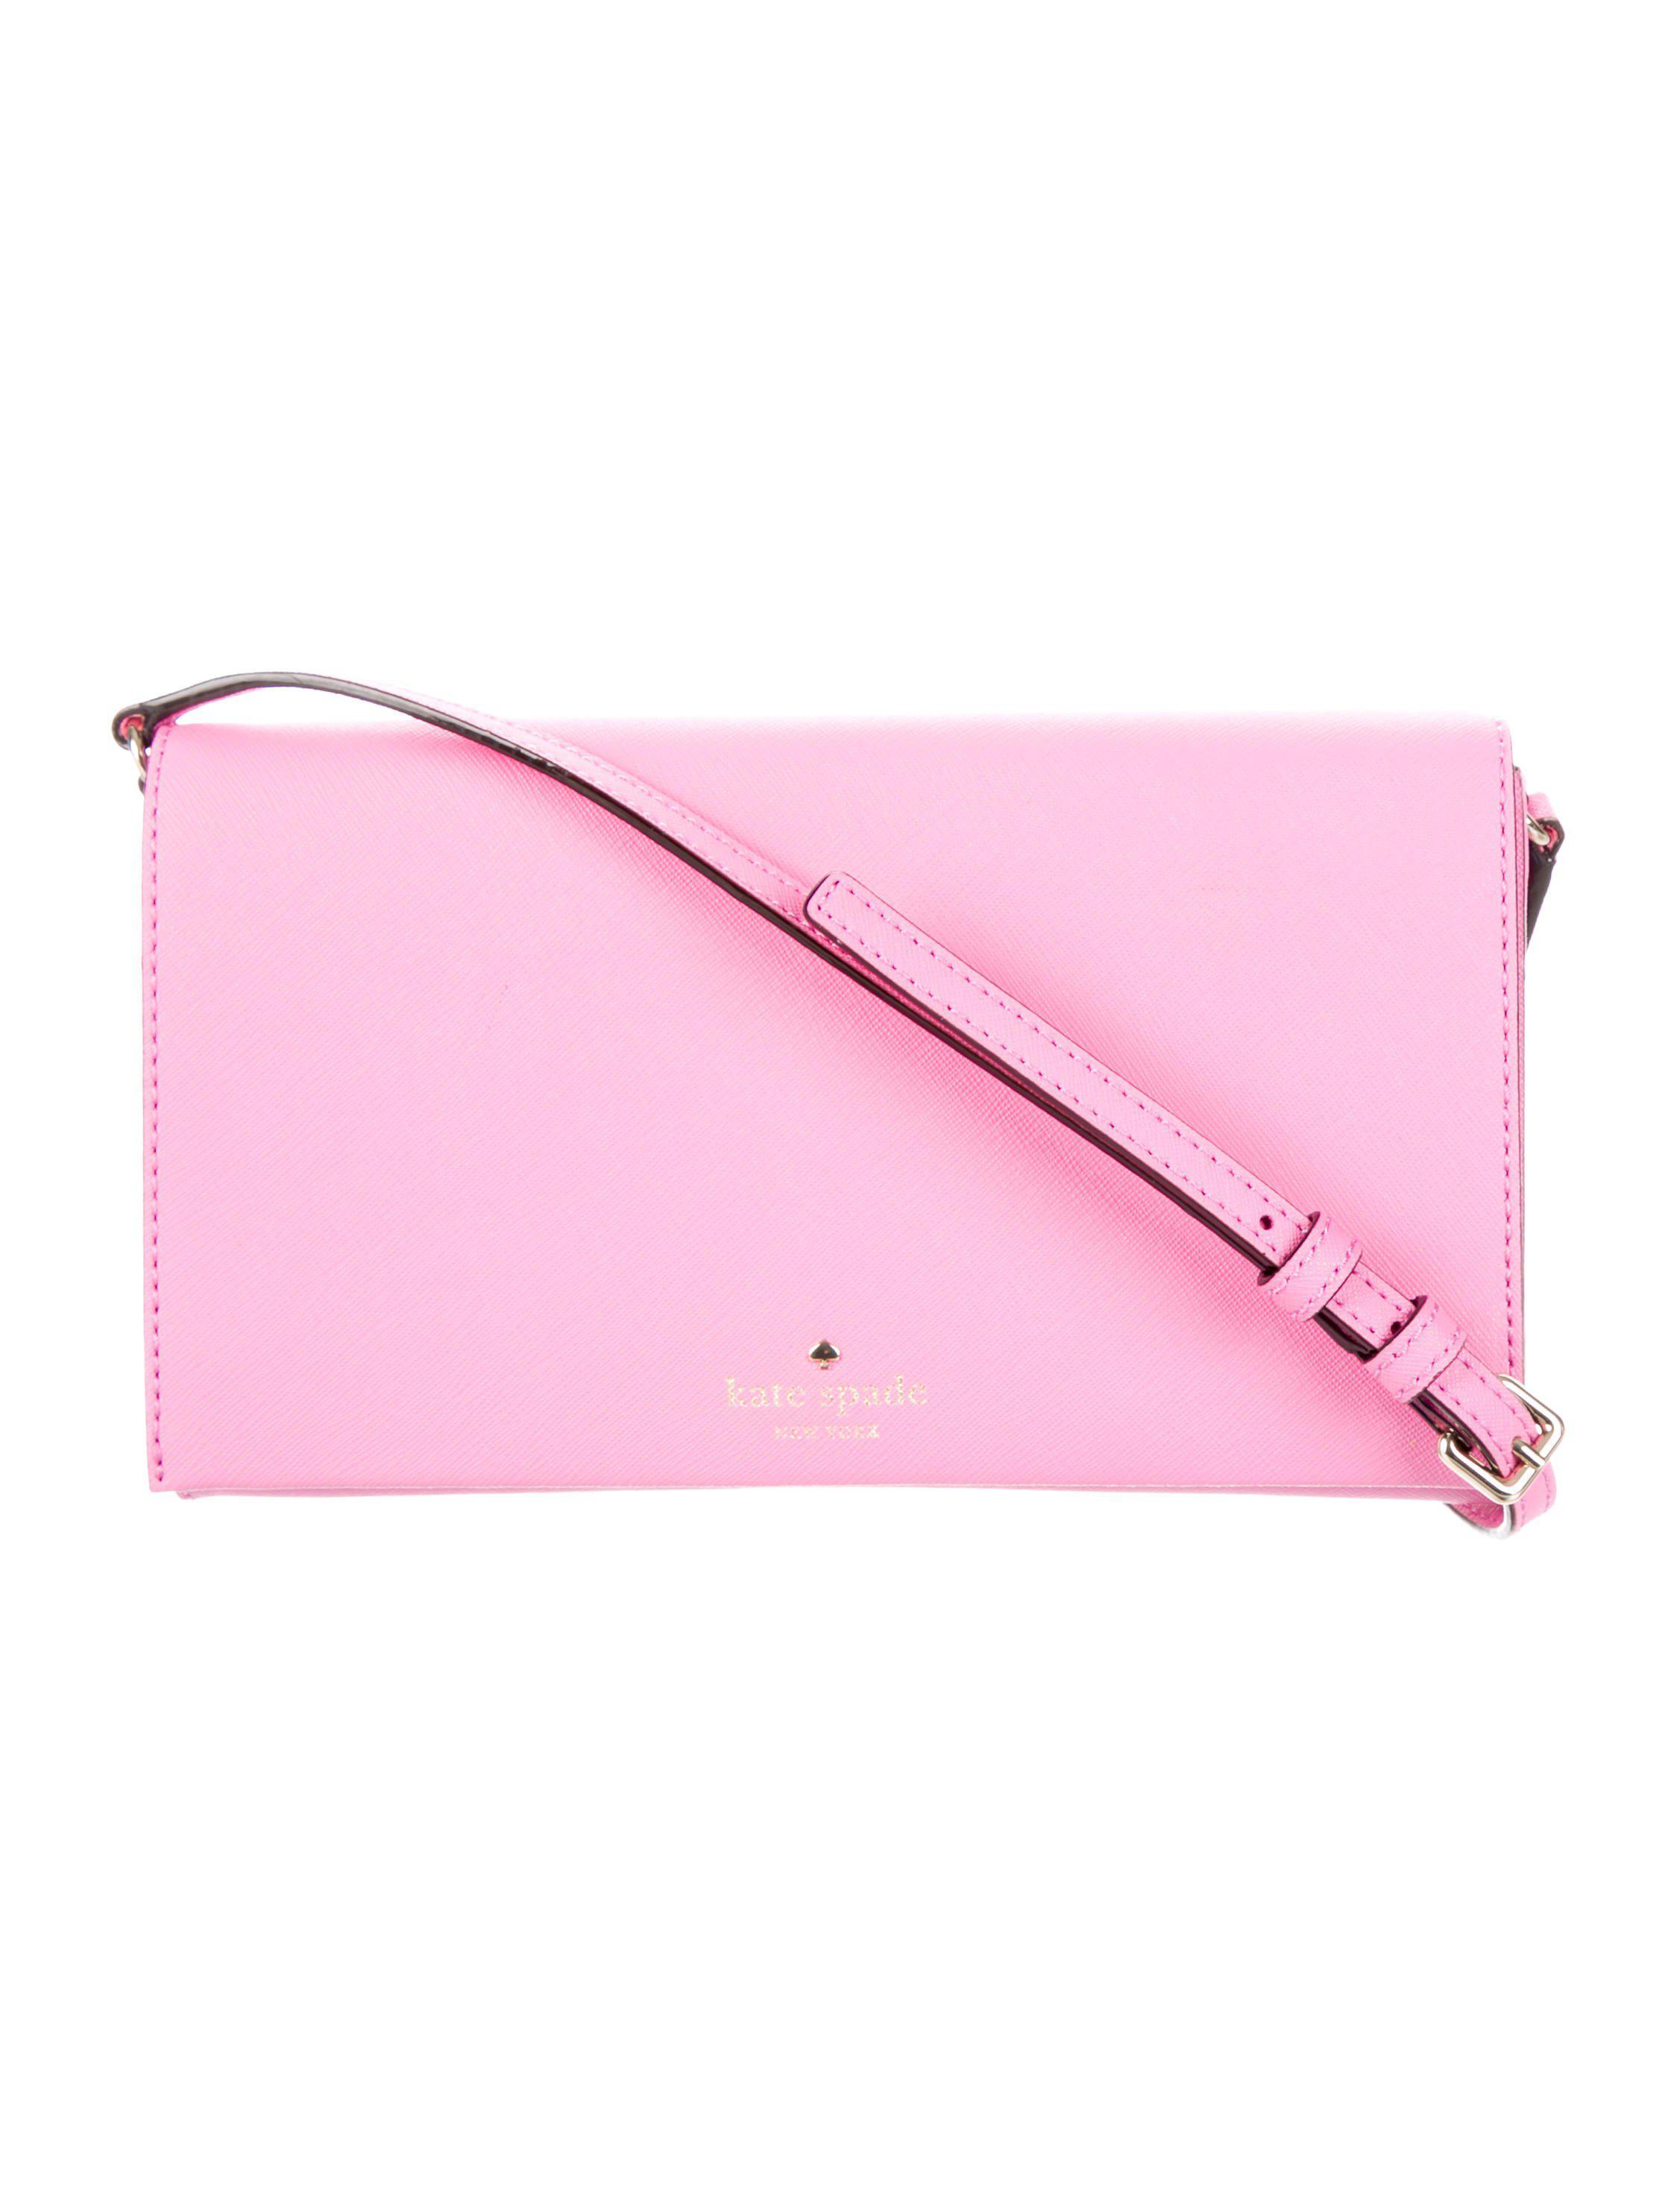 9c457576b093 Lyst - Kate Spade Cedar Street Cali Crossbody Bag Pink in Metallic